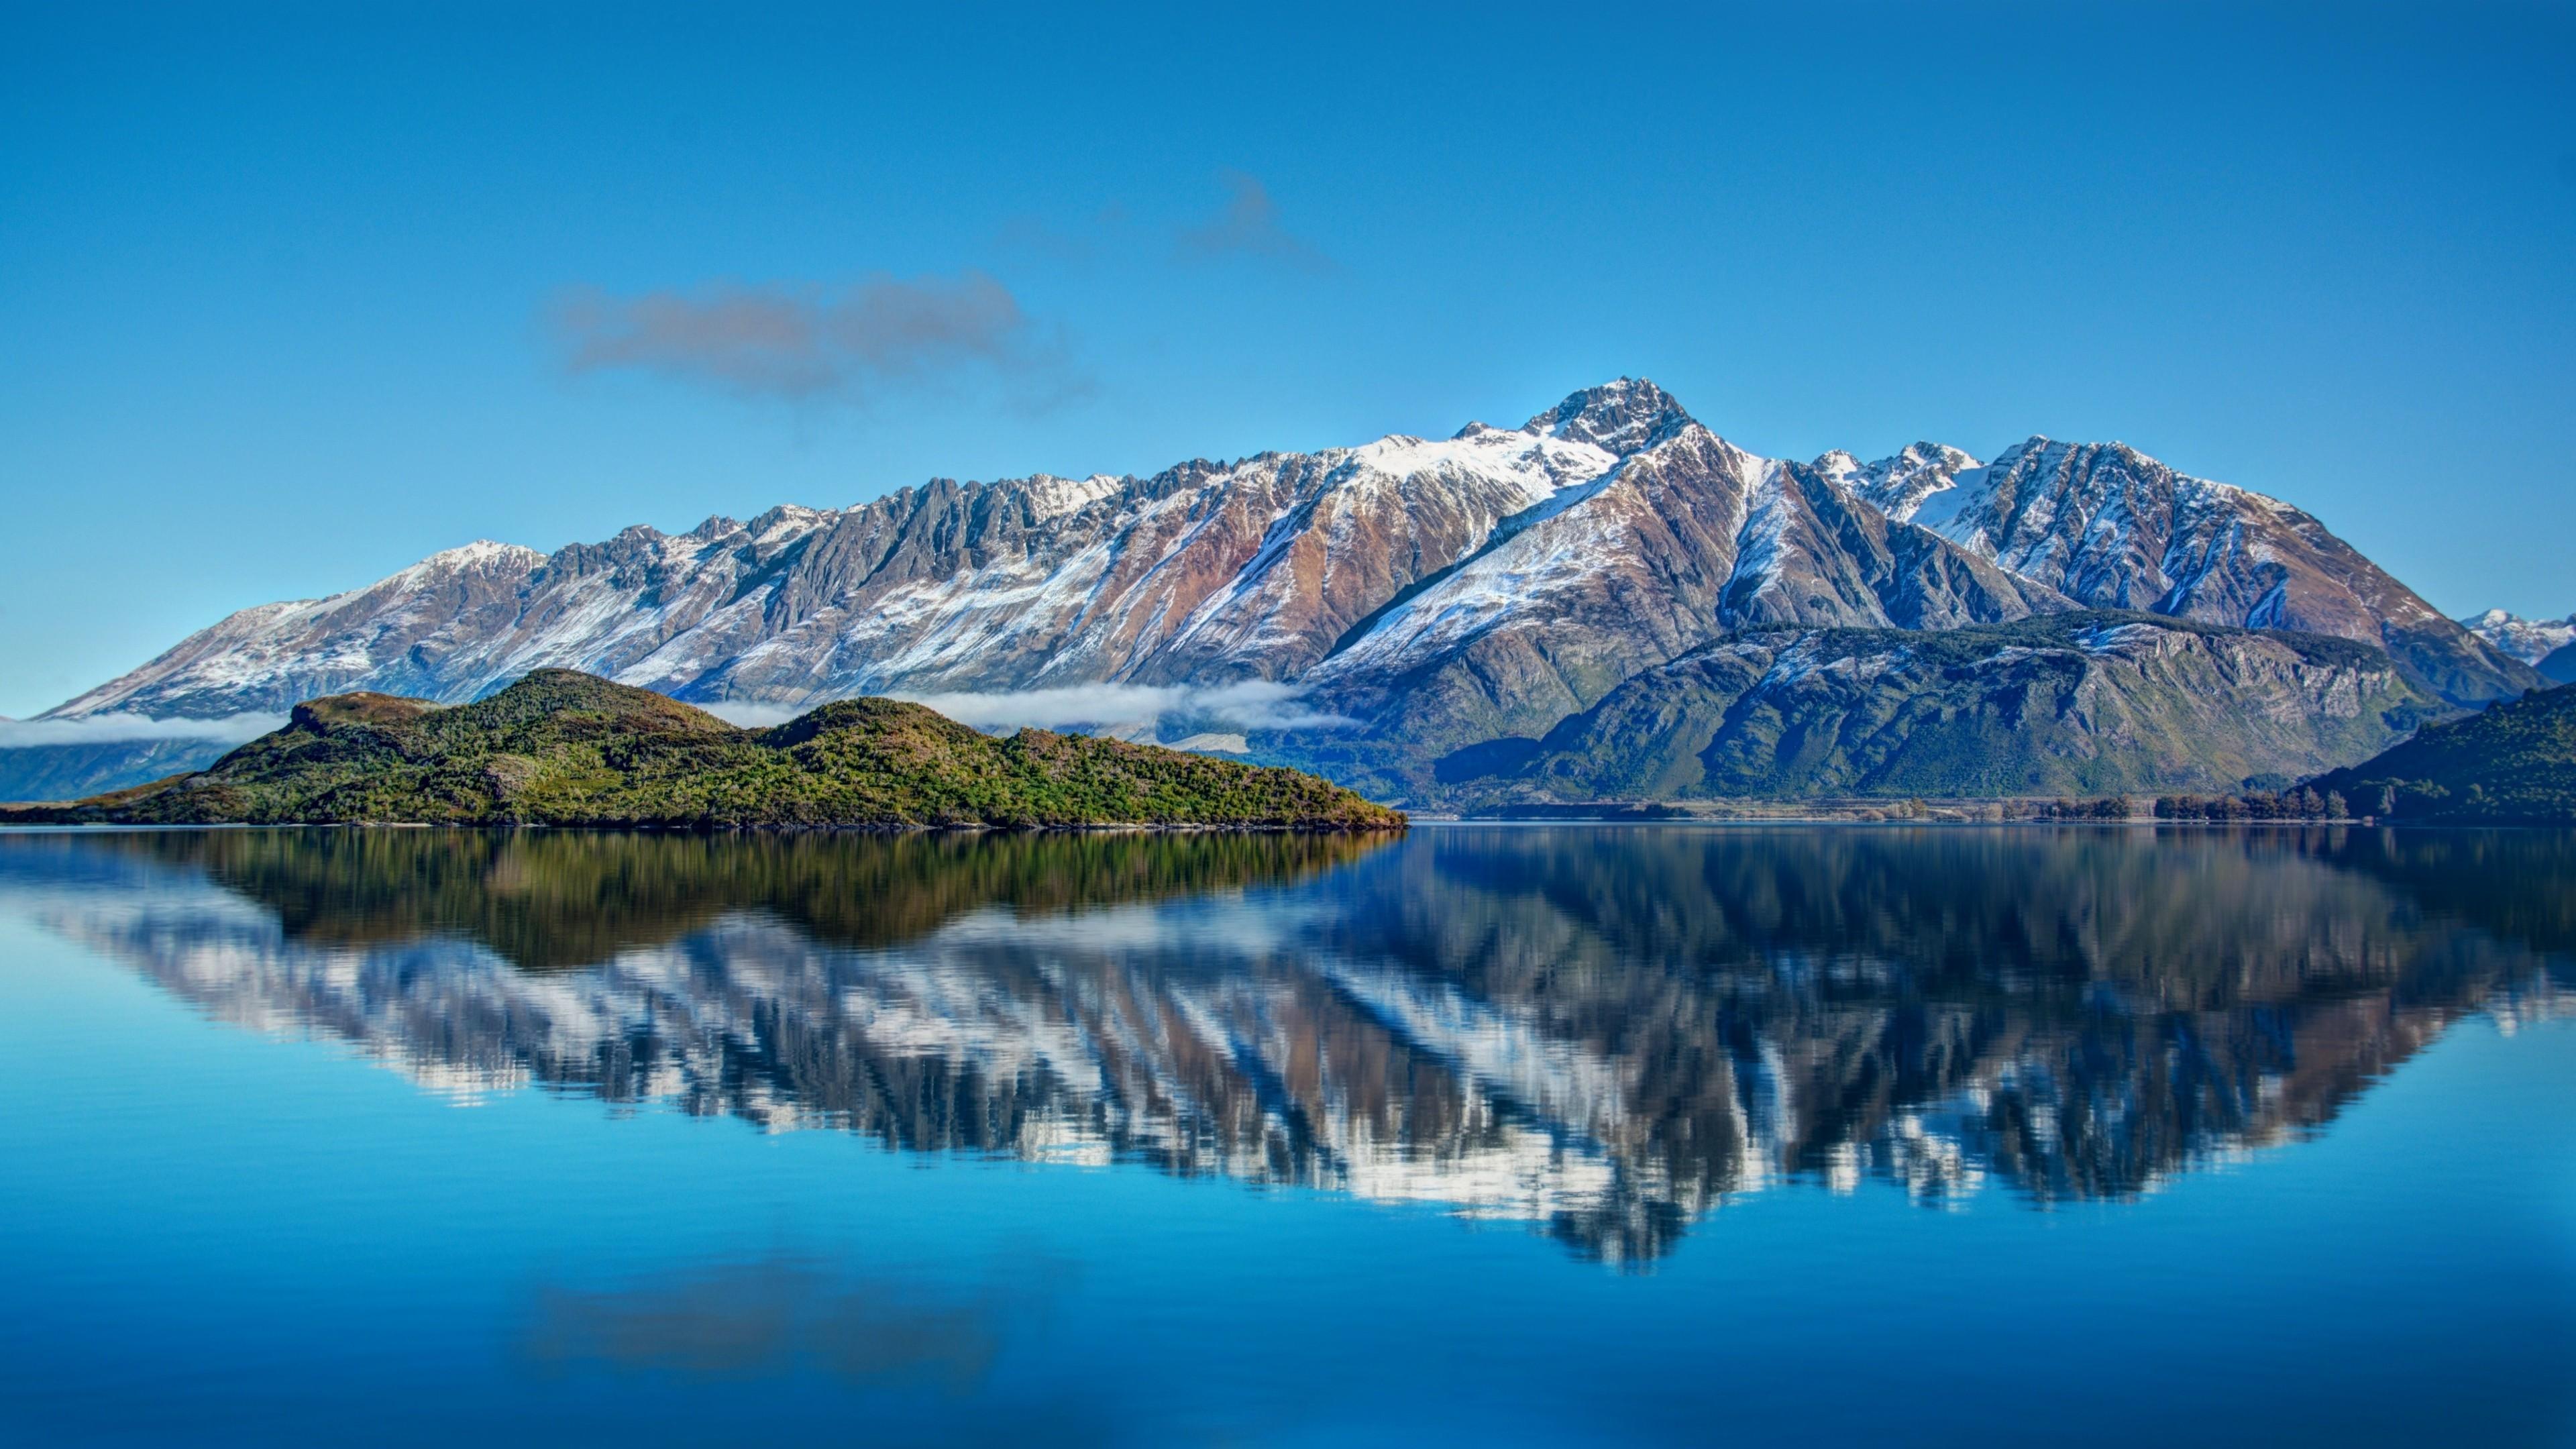 Wallpaper New Zealand, Mountain, 4k, HD Wallpaper, Lake